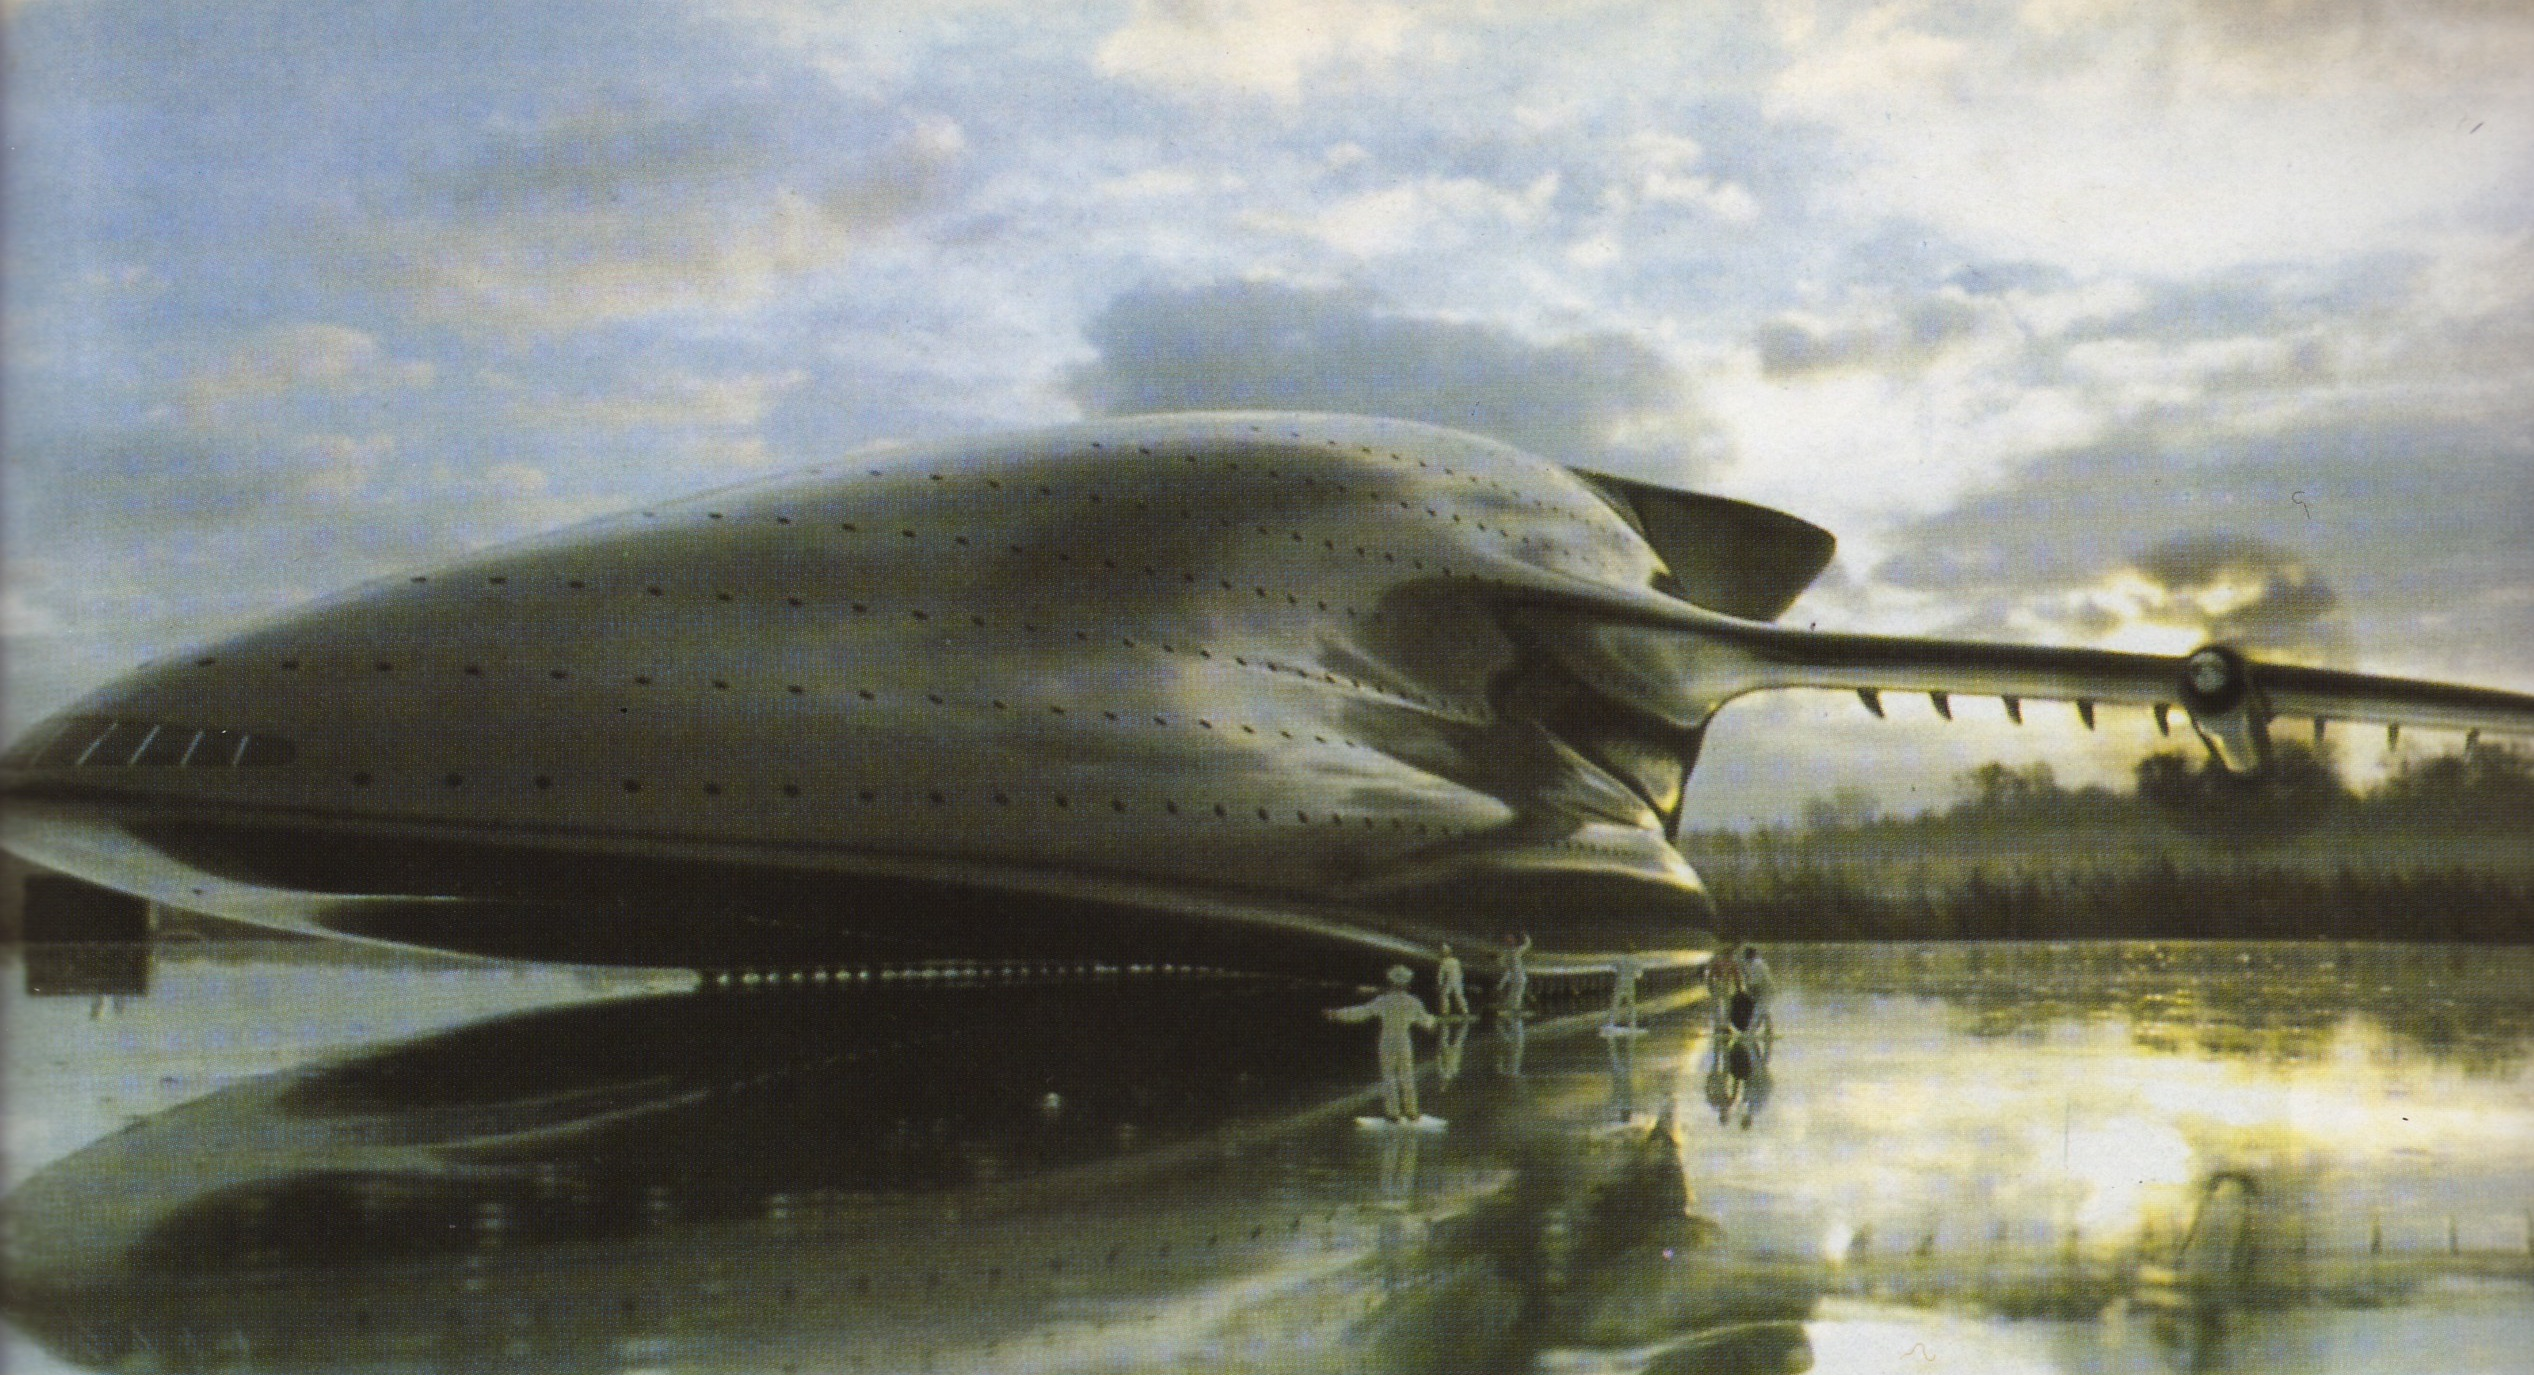 Luigi Colani | Jumbo carrier | 1978